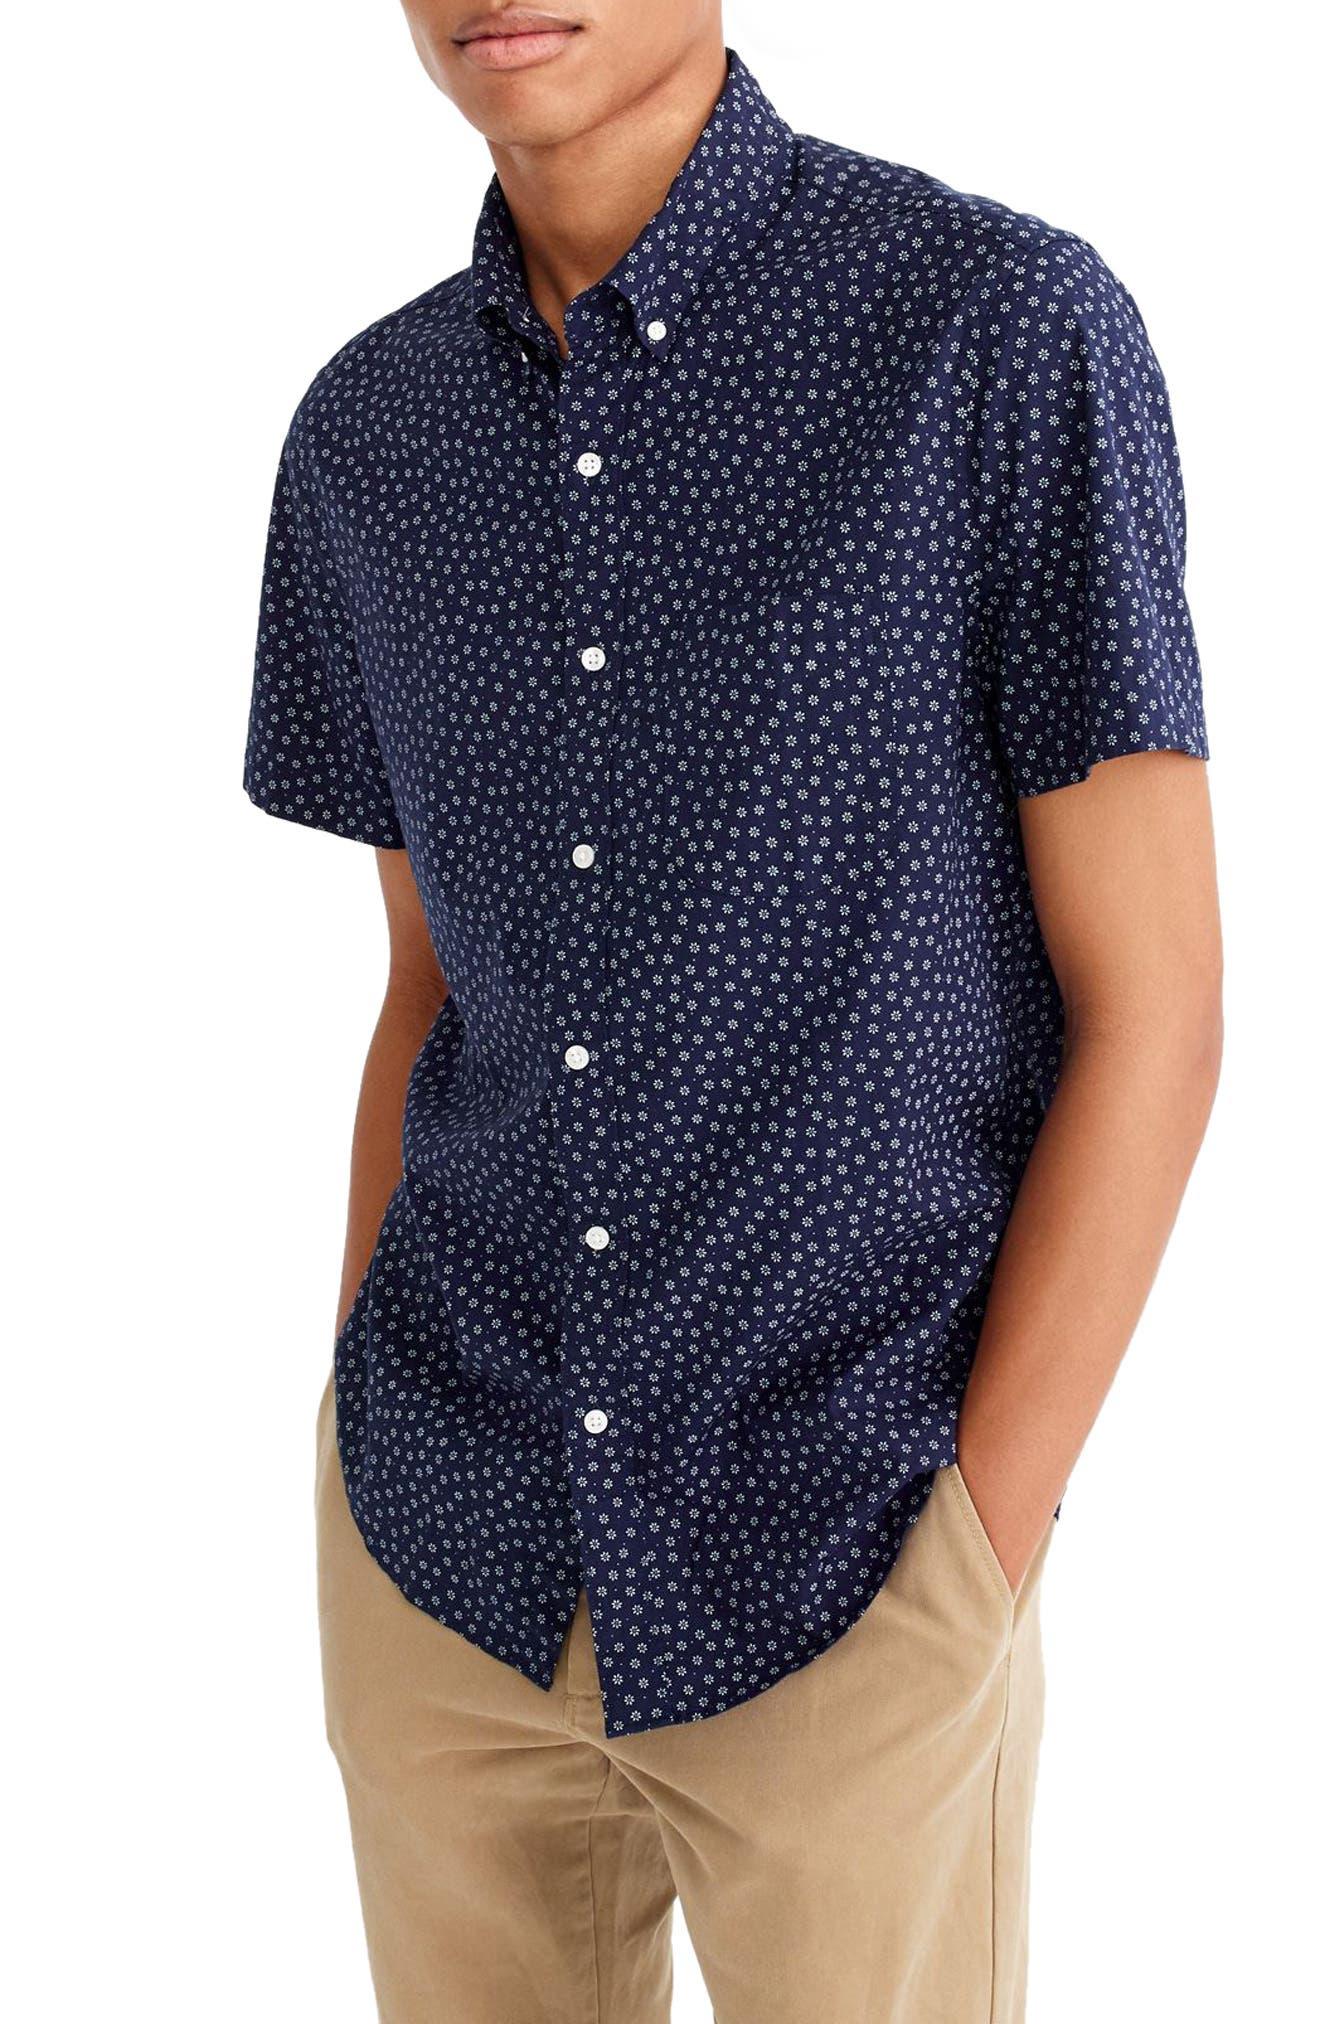 Main Image - J.Crew Slim Fit Stretch Secret Wash Short Sleeve Daisy Print Sport Shirt